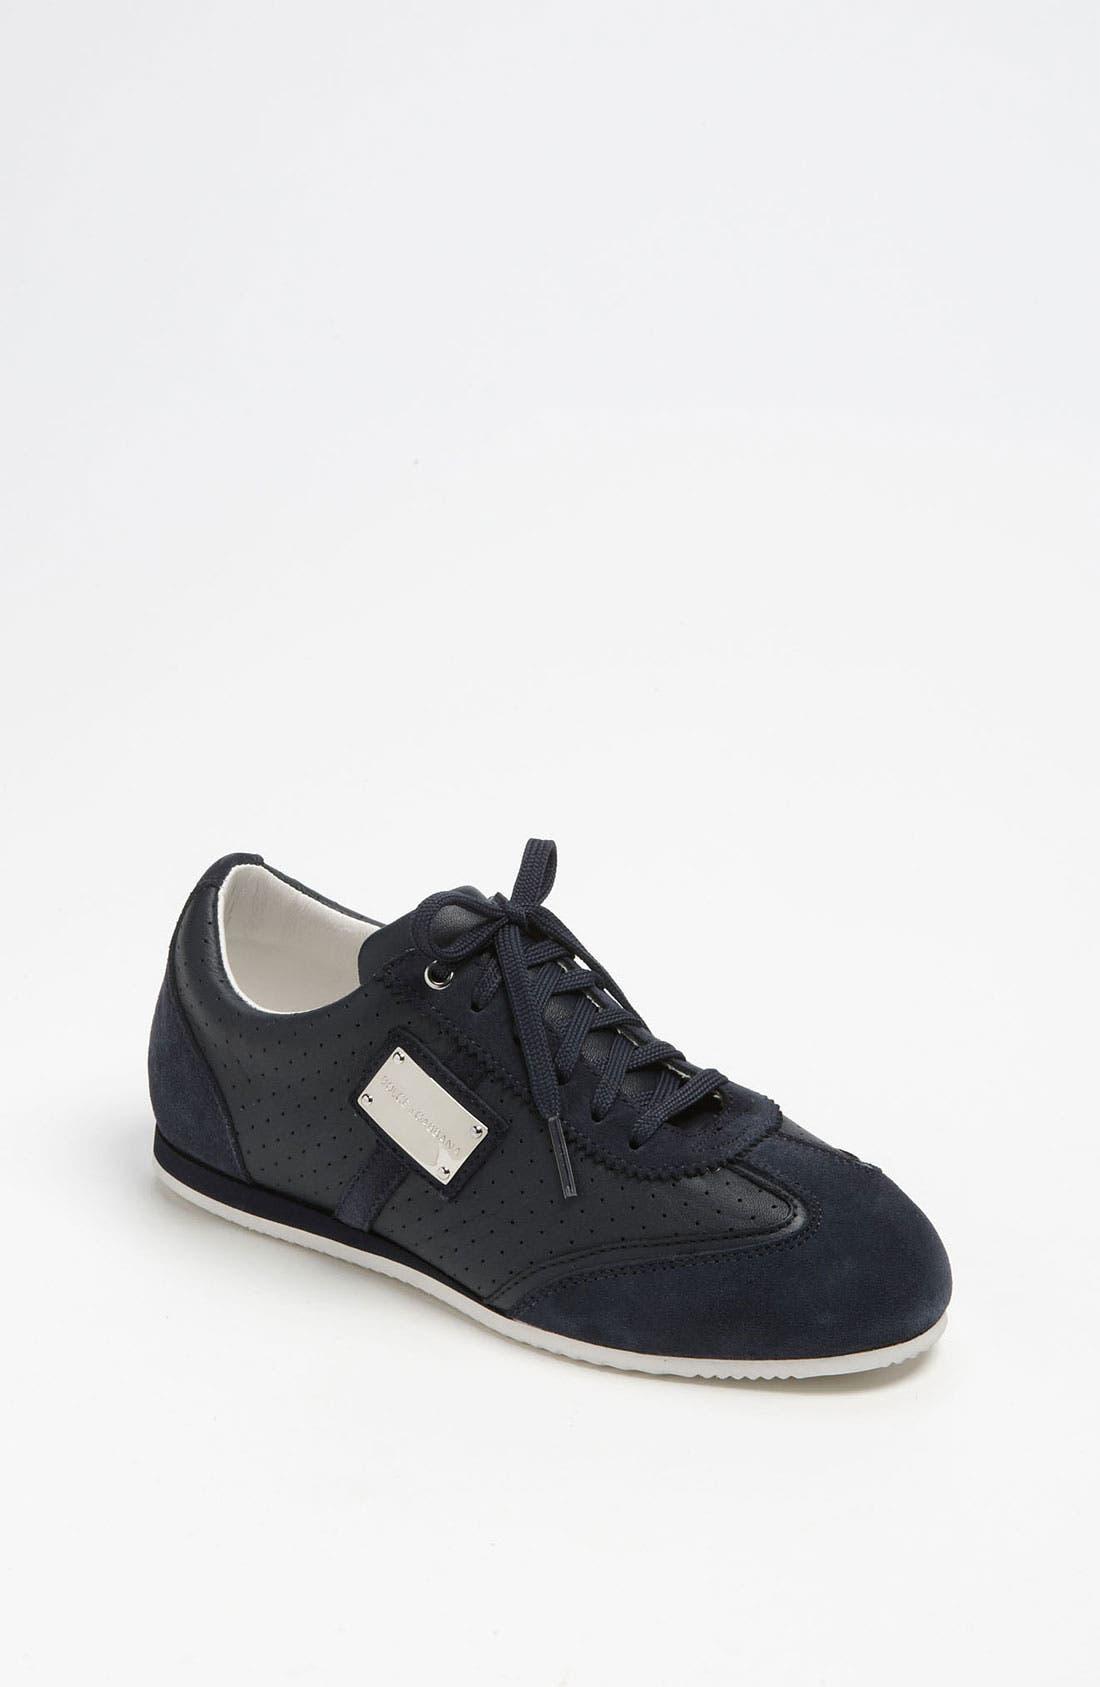 Alternate Image 1 Selected - Dolce&Gabbana Lace-Up Sneaker (Toddler, Little Kid & Big Kid)